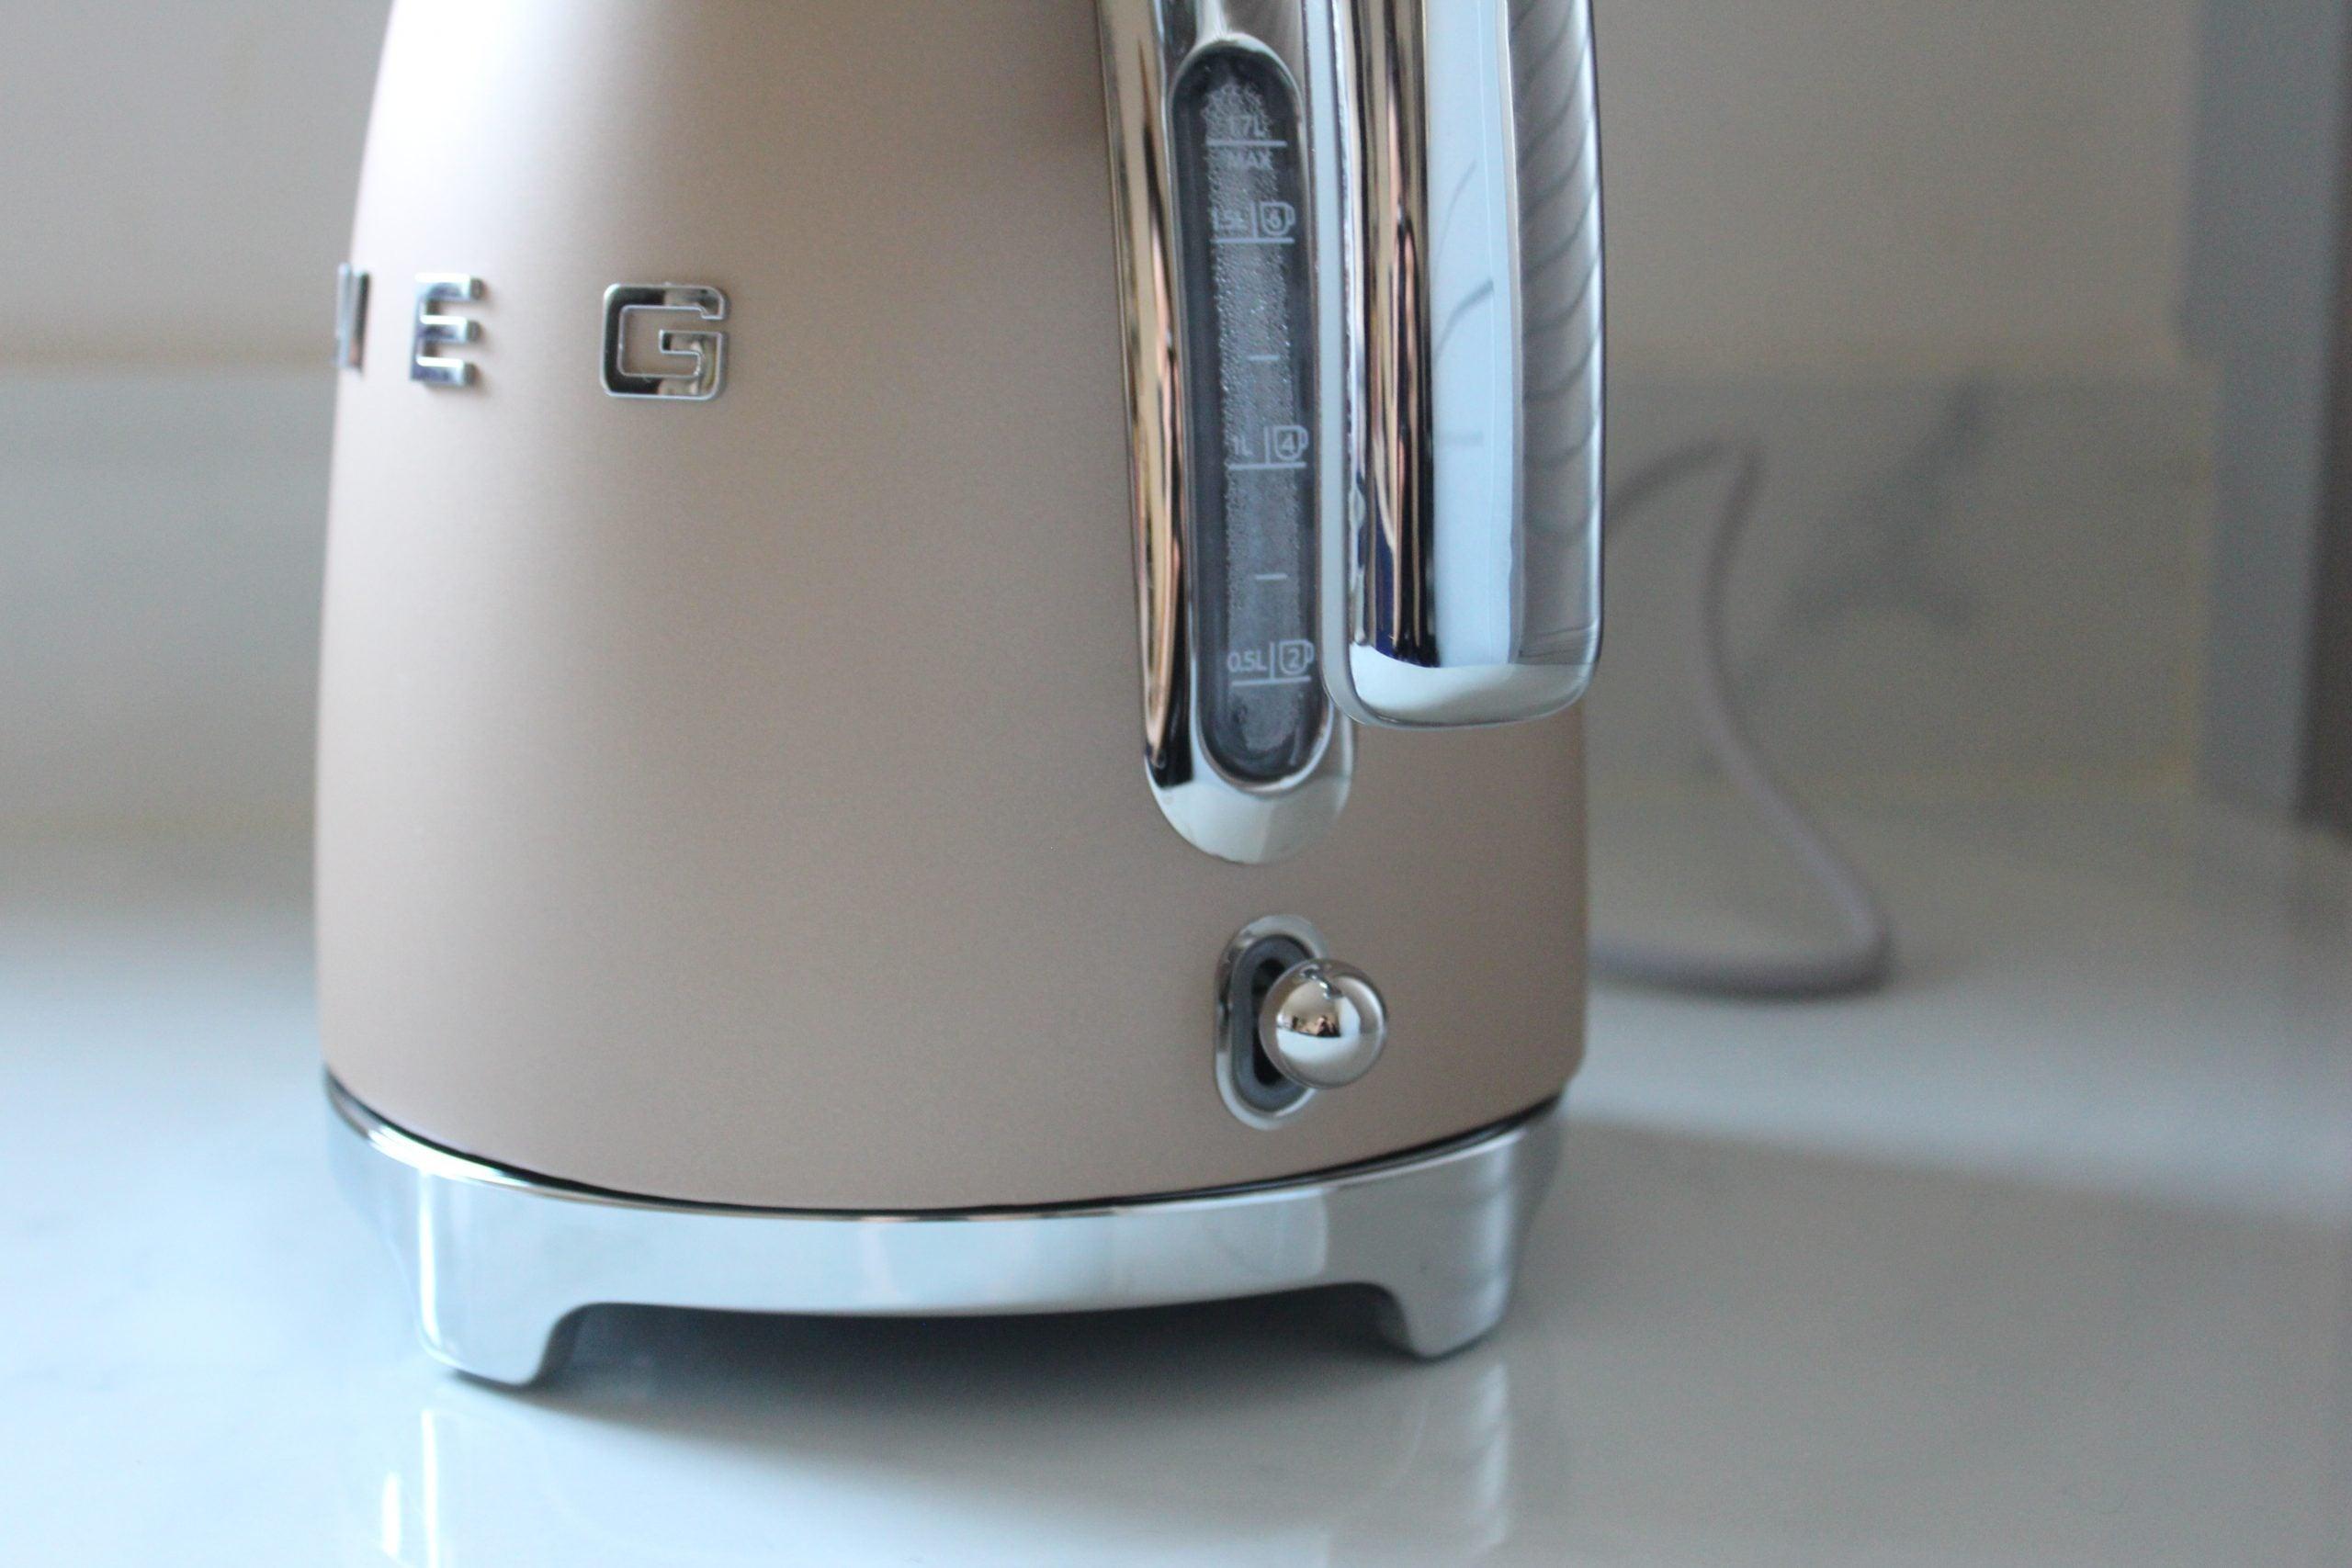 Чайник Smeg 50's Style KLF03 окно